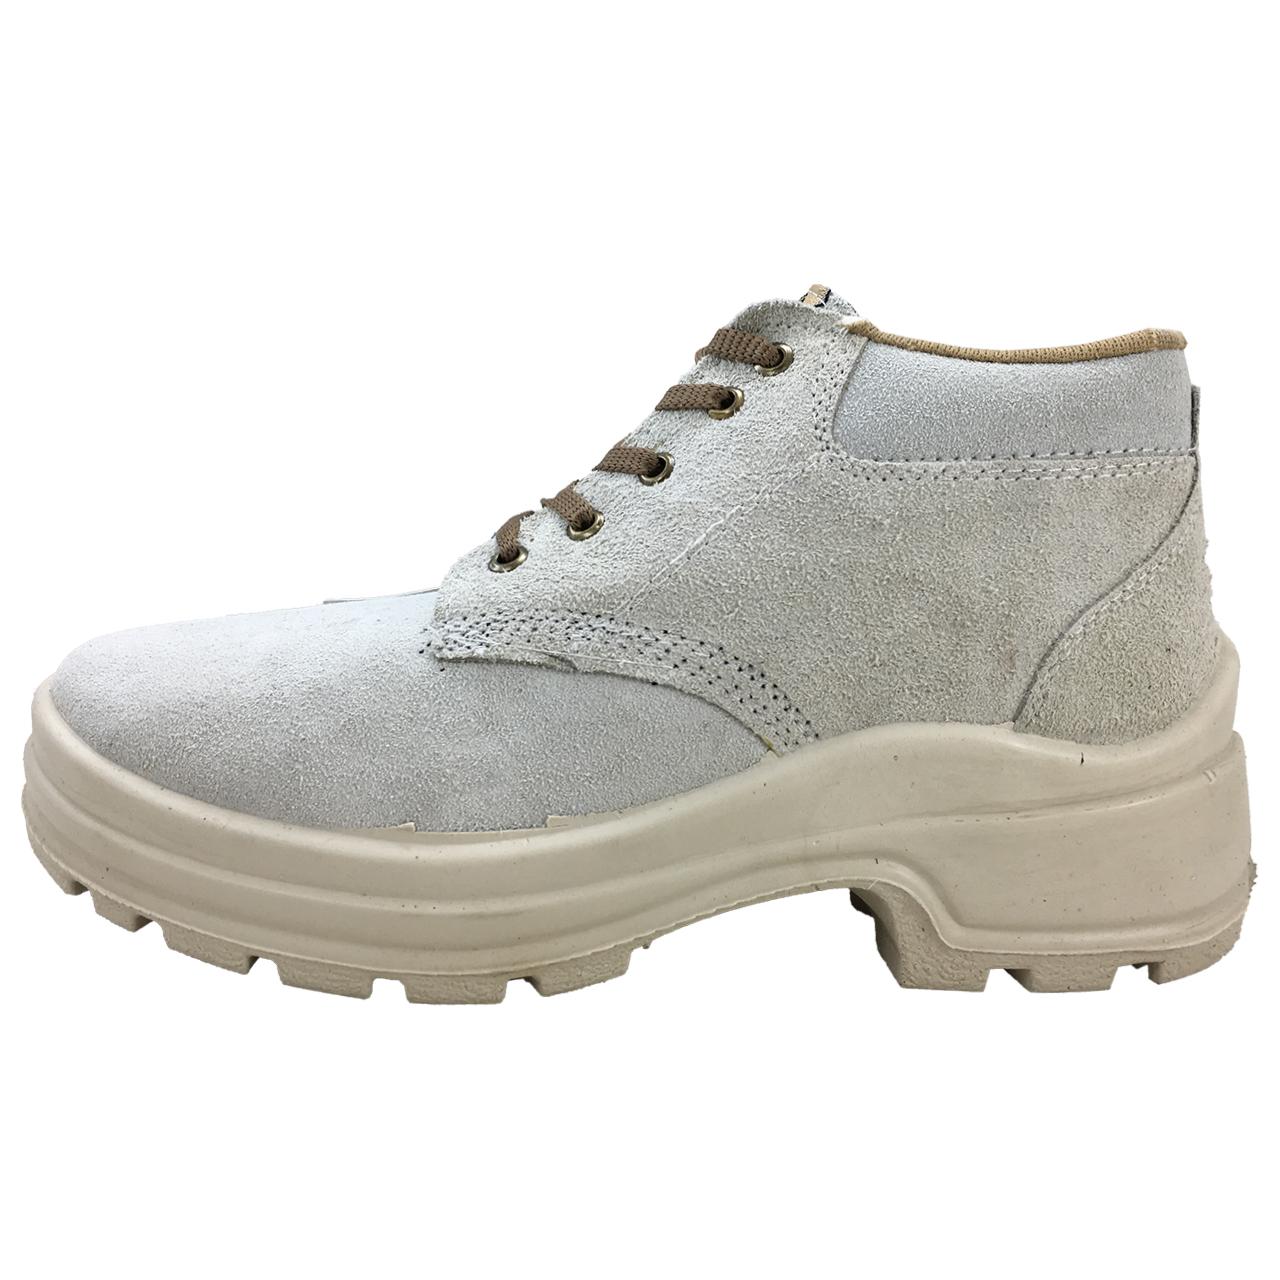 قیمت کفش کوهنوردی مردانه اسلوبی مدل الوند کد 2705